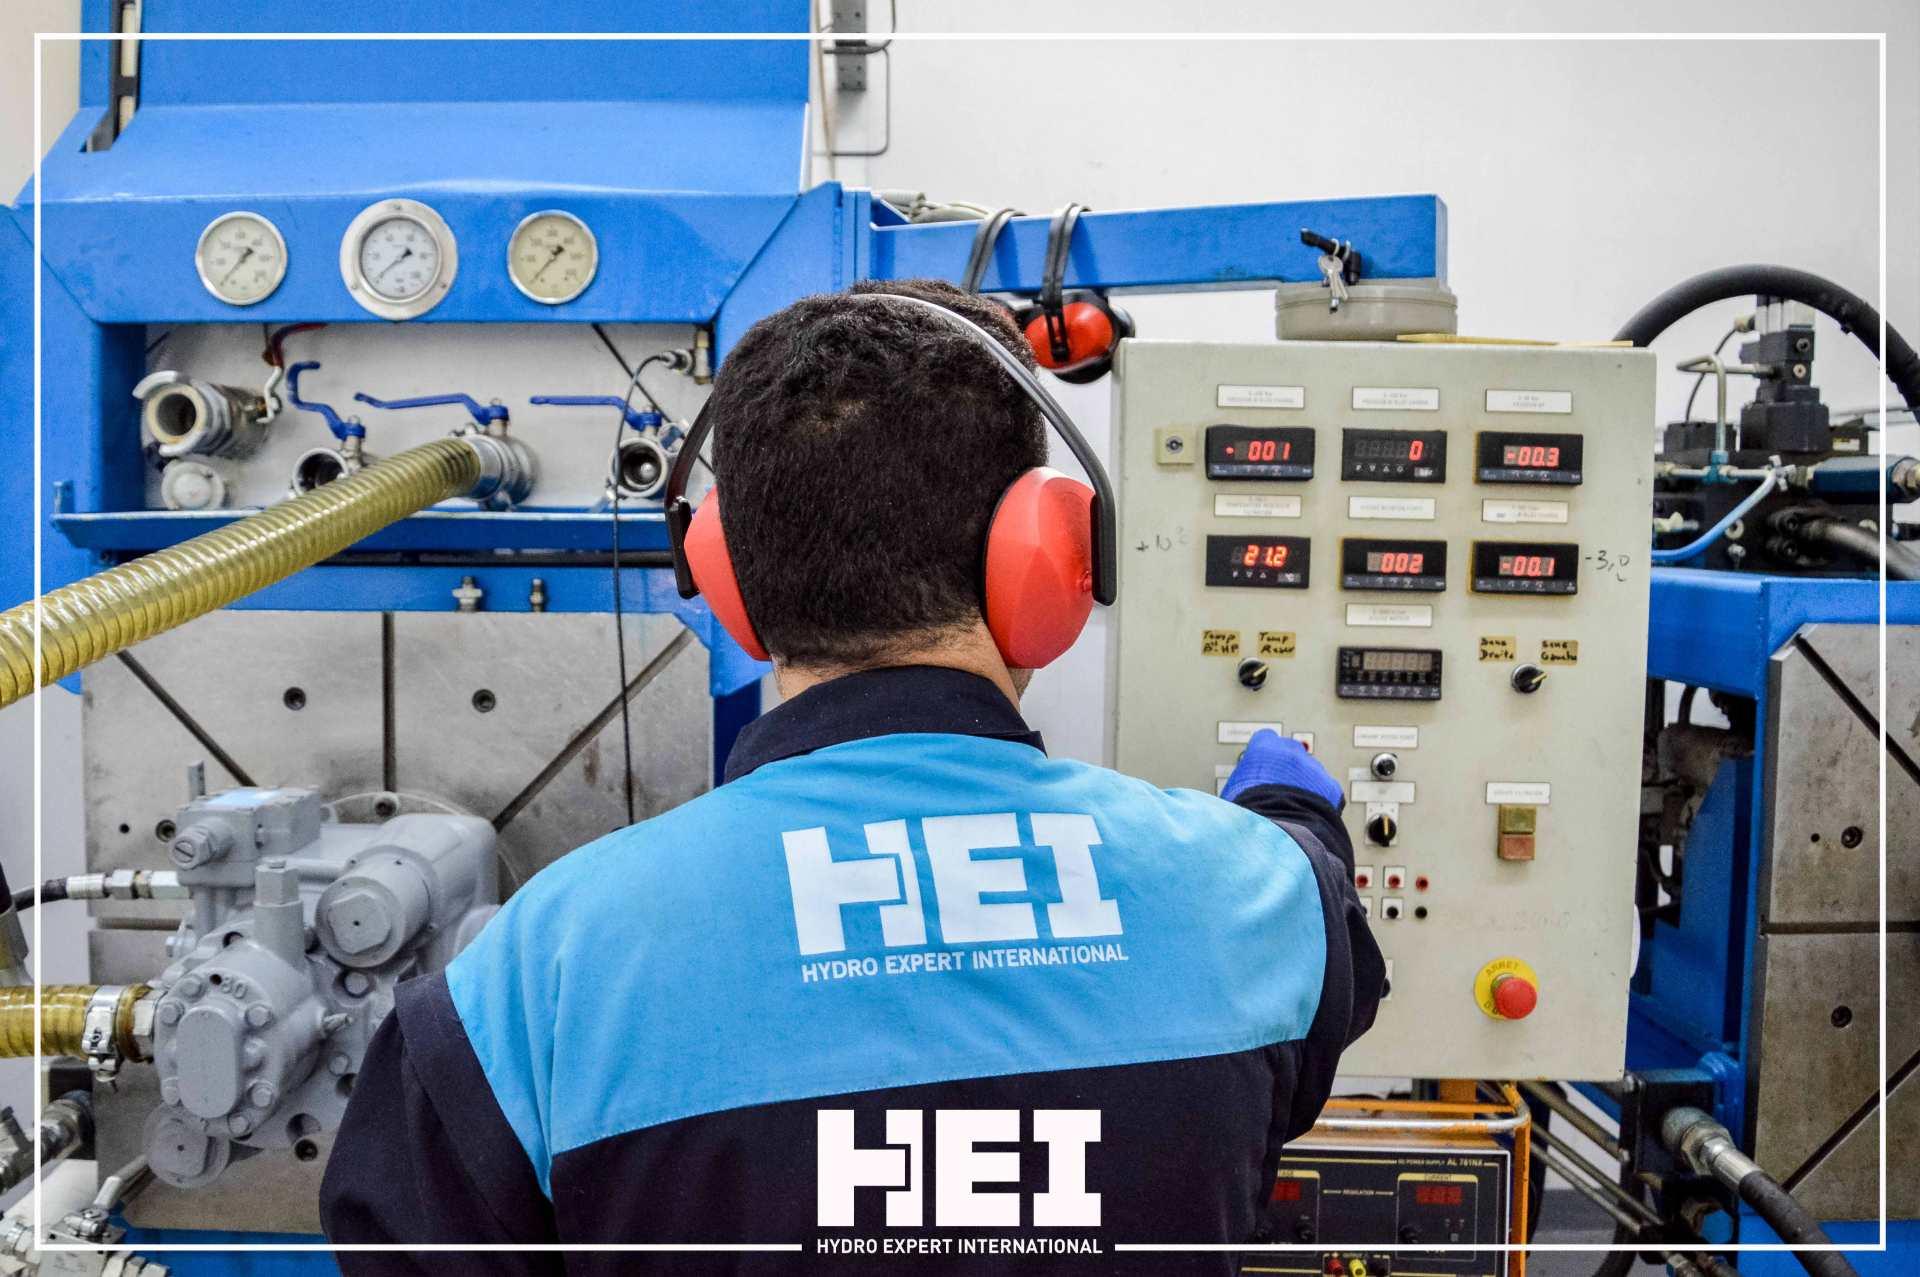 Banc d'essai HEI Tunis, solutions hydrauliques en Tunisie